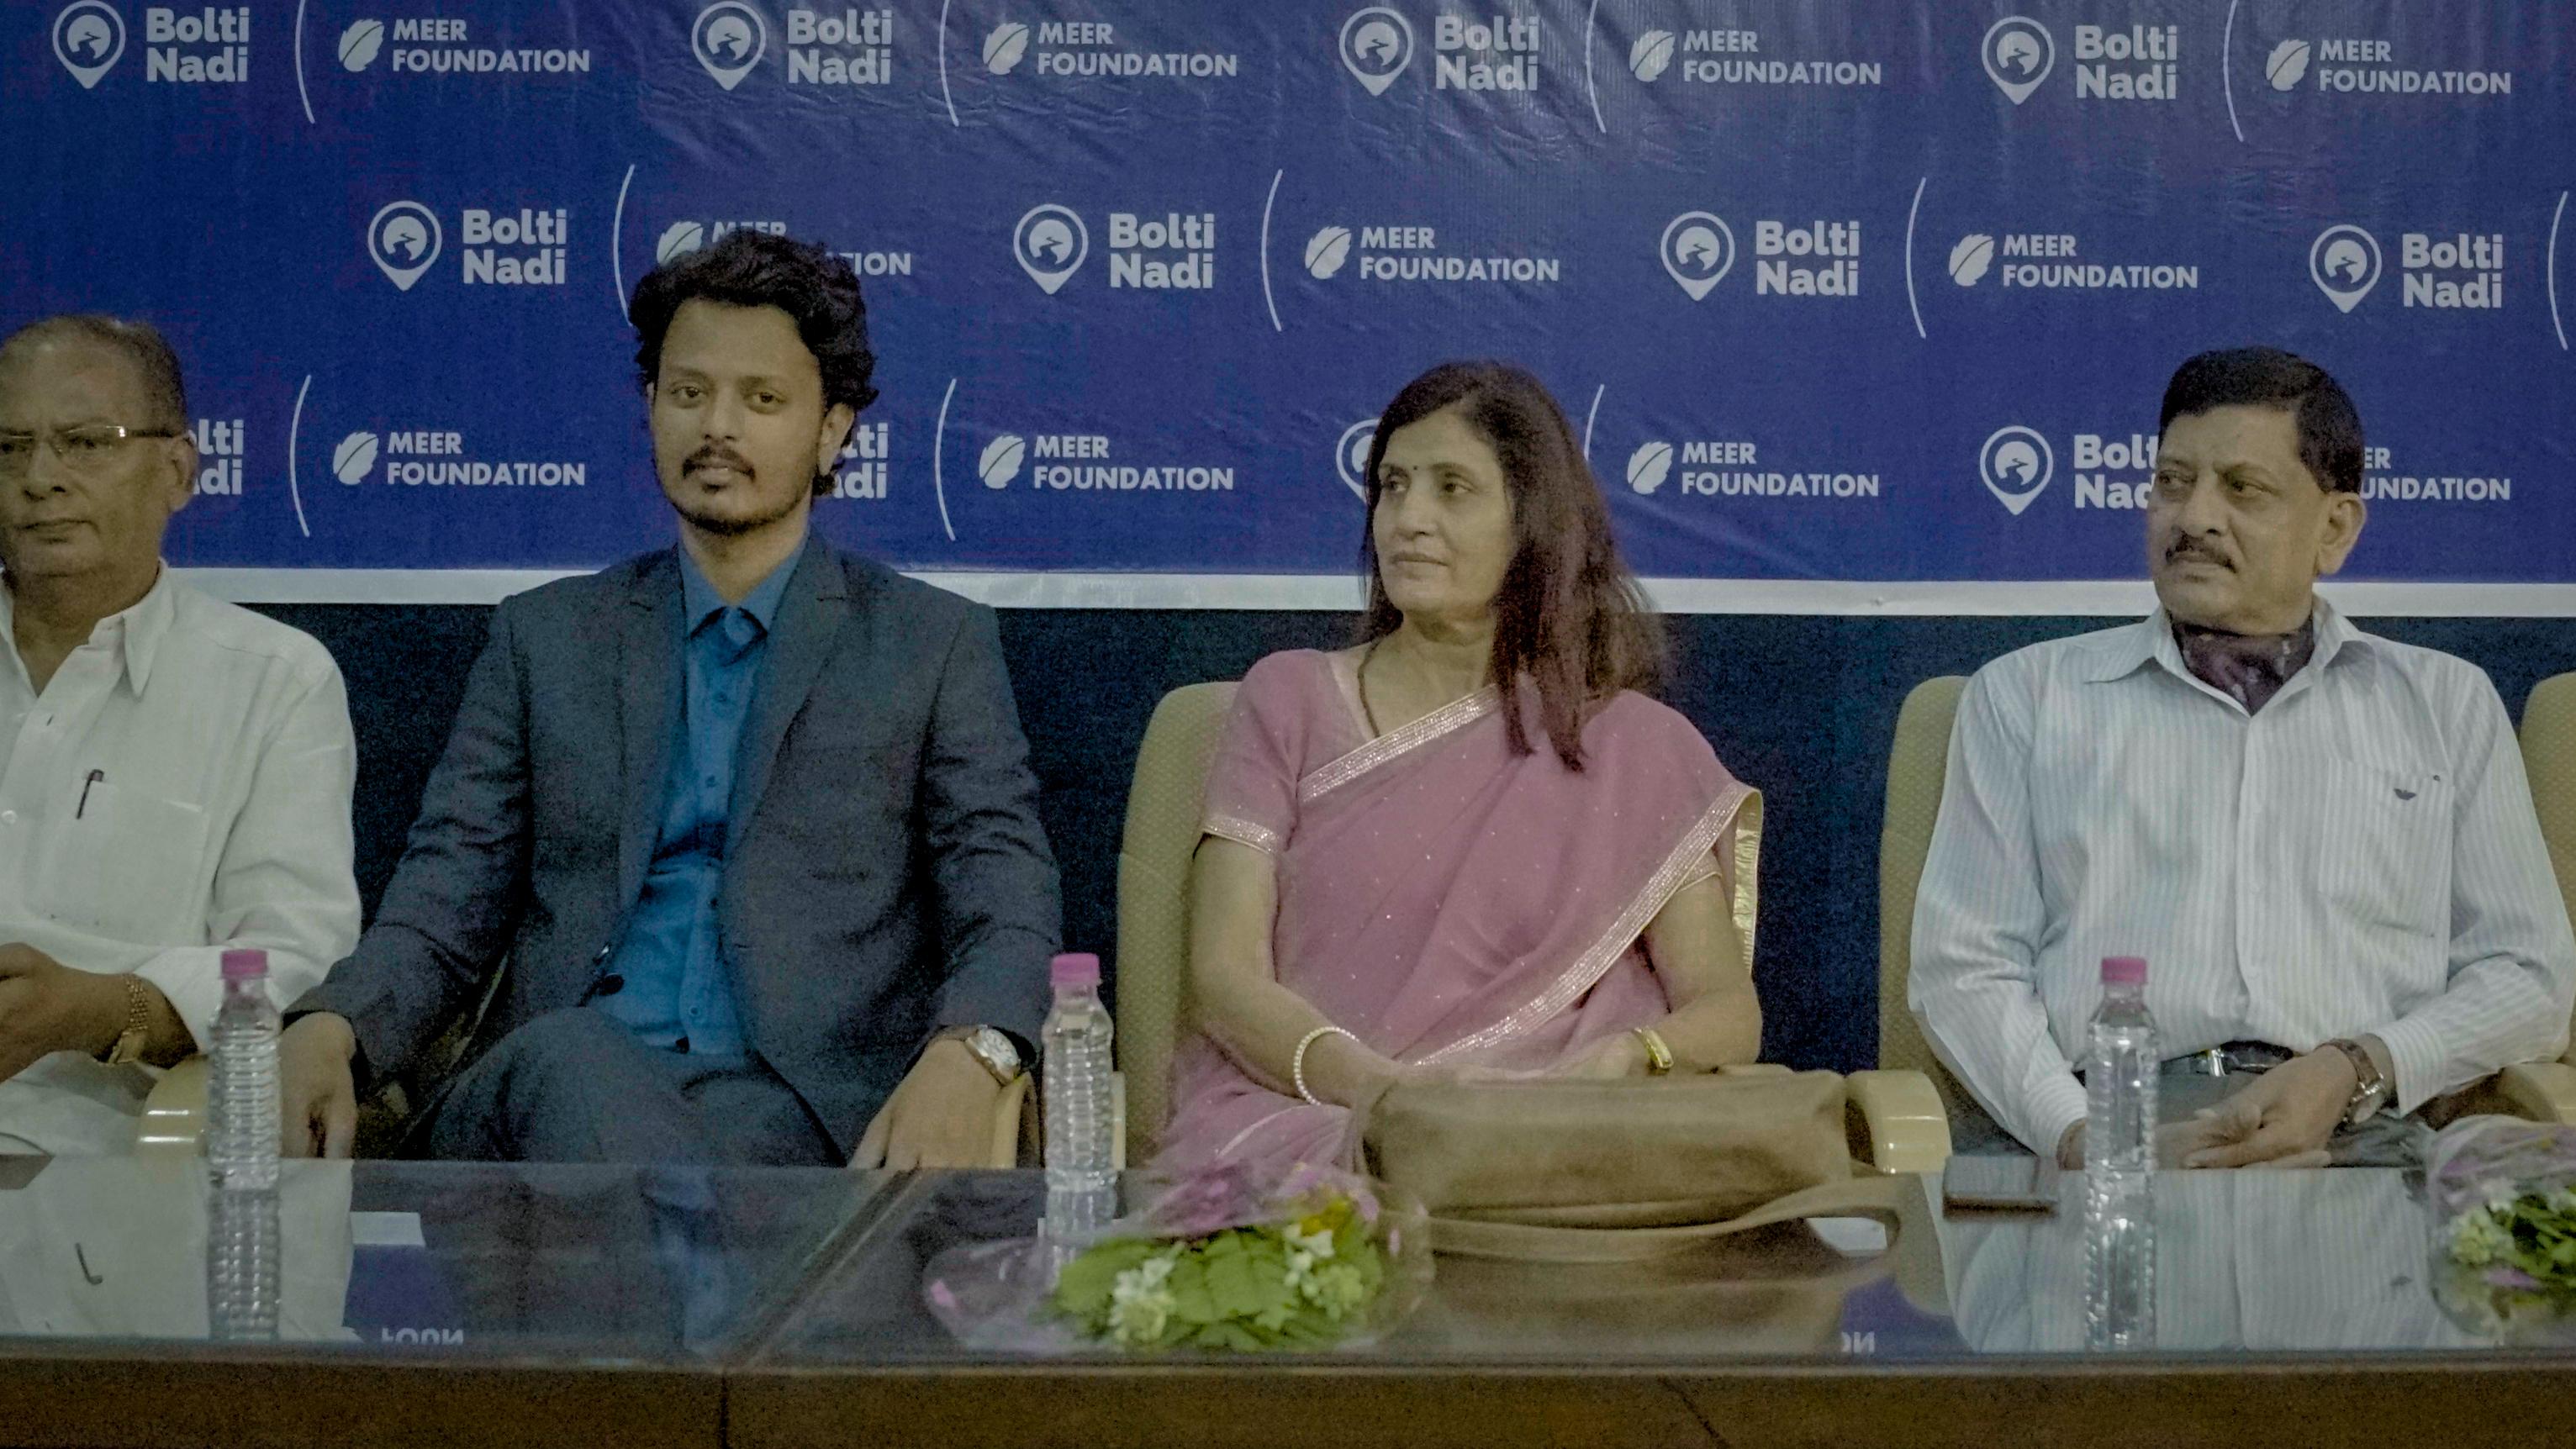 Meer Foundation's Bolti Nadi Conclave 2019 Amir Hashmi Kavi Meer Ali Meer